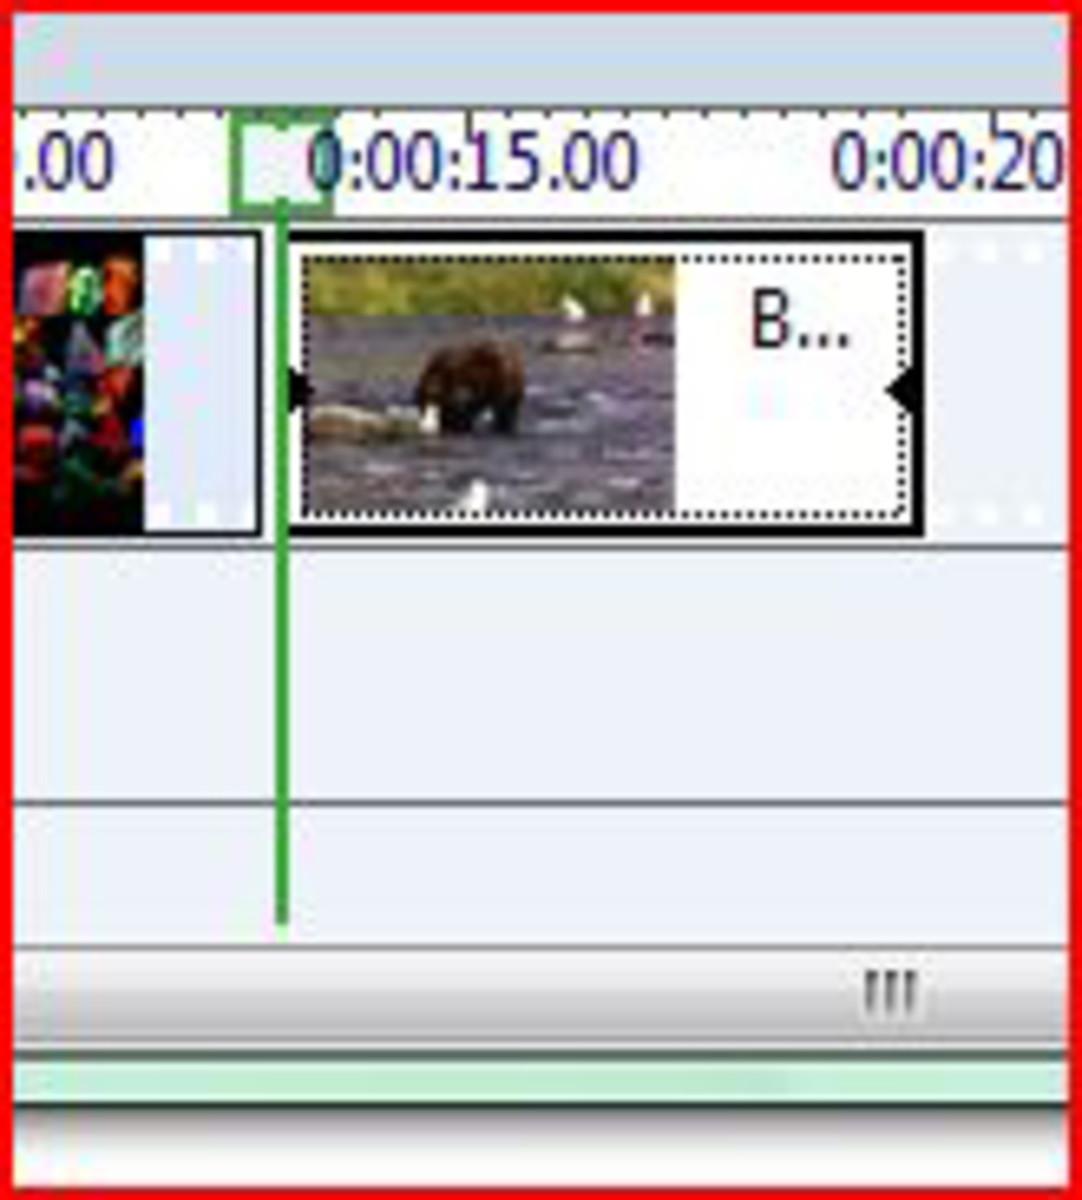 Shorten video by dragging in the arrows